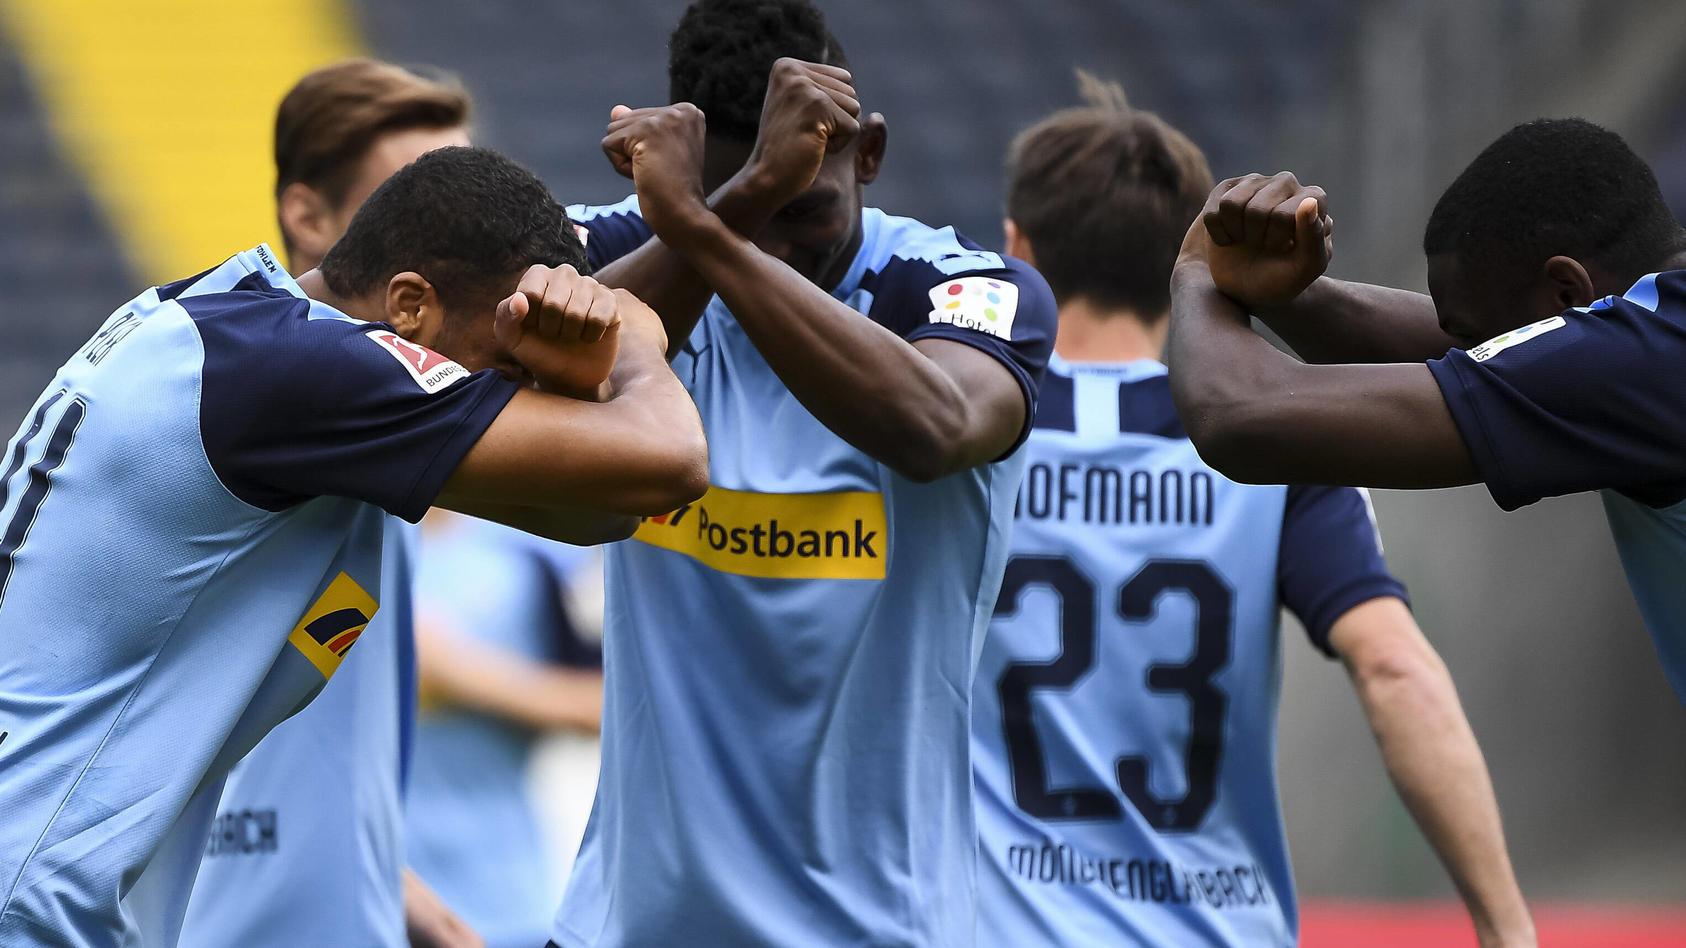 Fussball 1.Bundesliga, Eintracht Frankfurt - Borussia Moenchengladbach 16.05.2020, xjhx, Fussball 1.Bundesliga, 26.Spiel